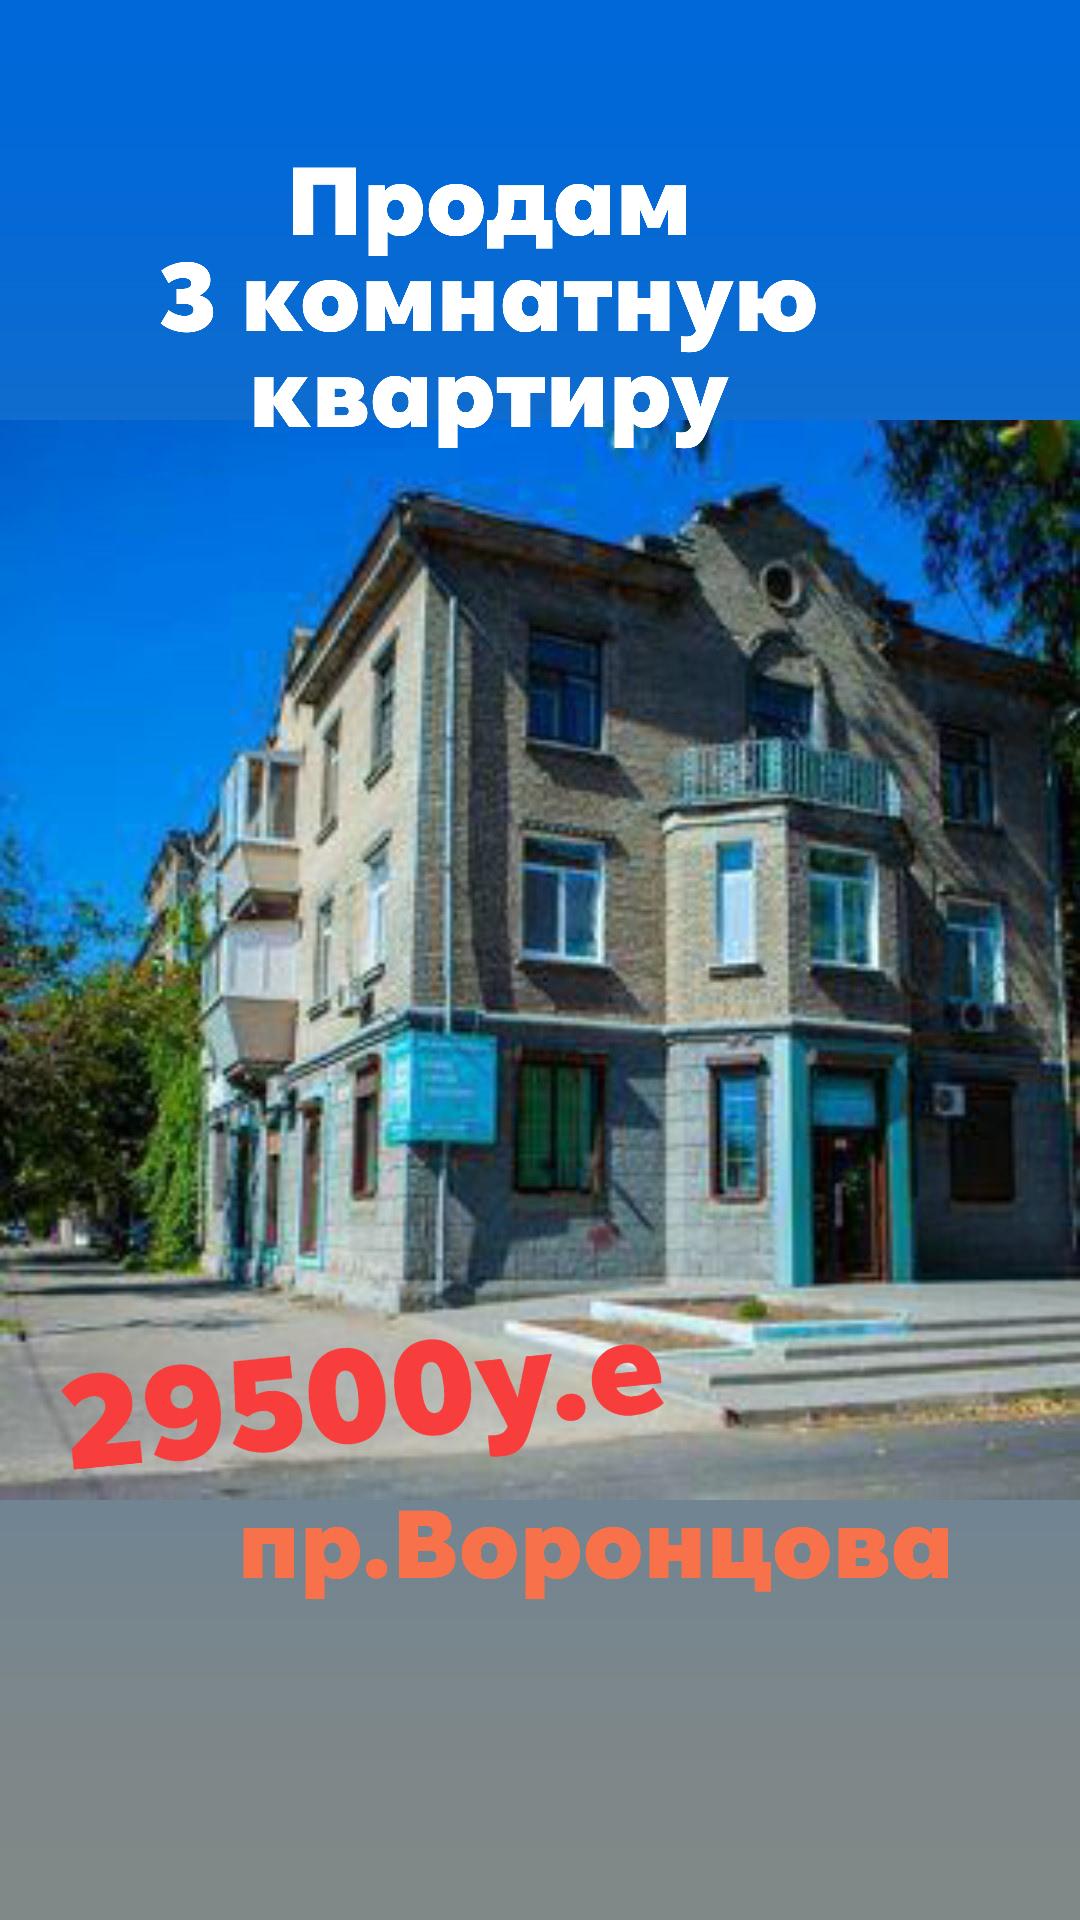 Продам 3 комнатную квартиру на Воронцова